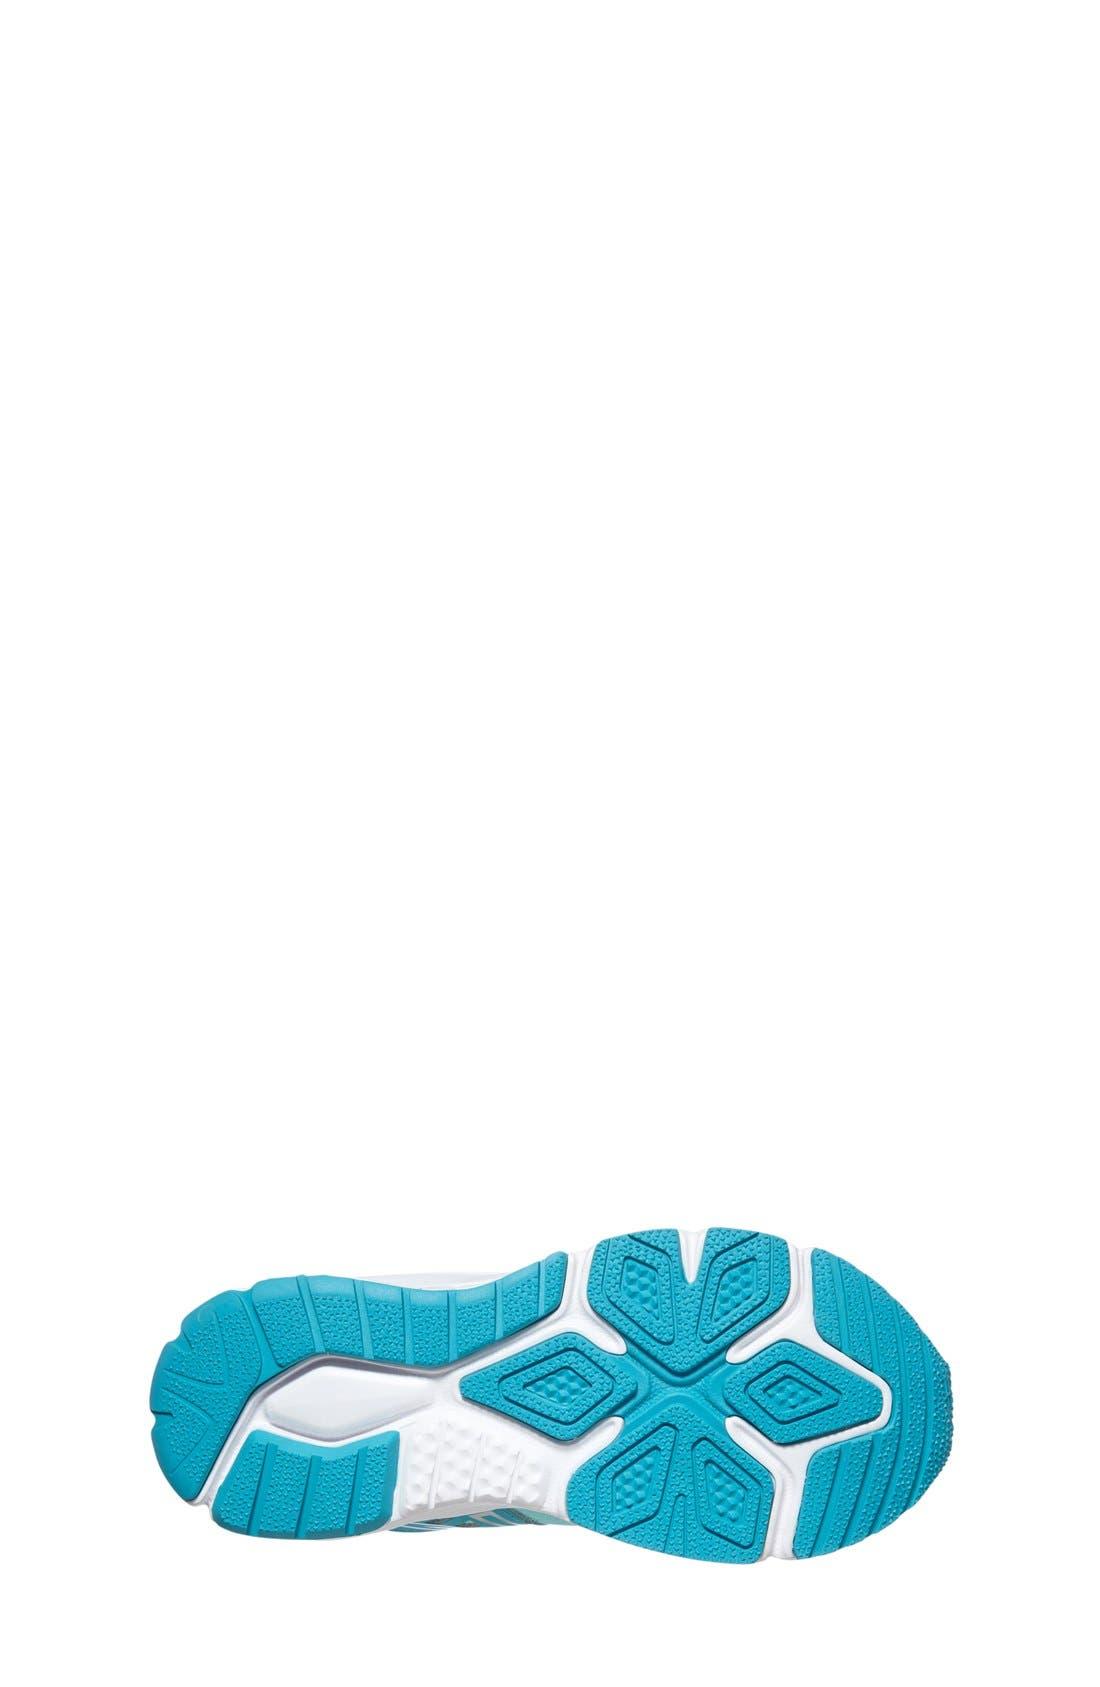 '200 Rush Vazee' Athletic Shoe,                             Alternate thumbnail 4, color,                             Sea Glass